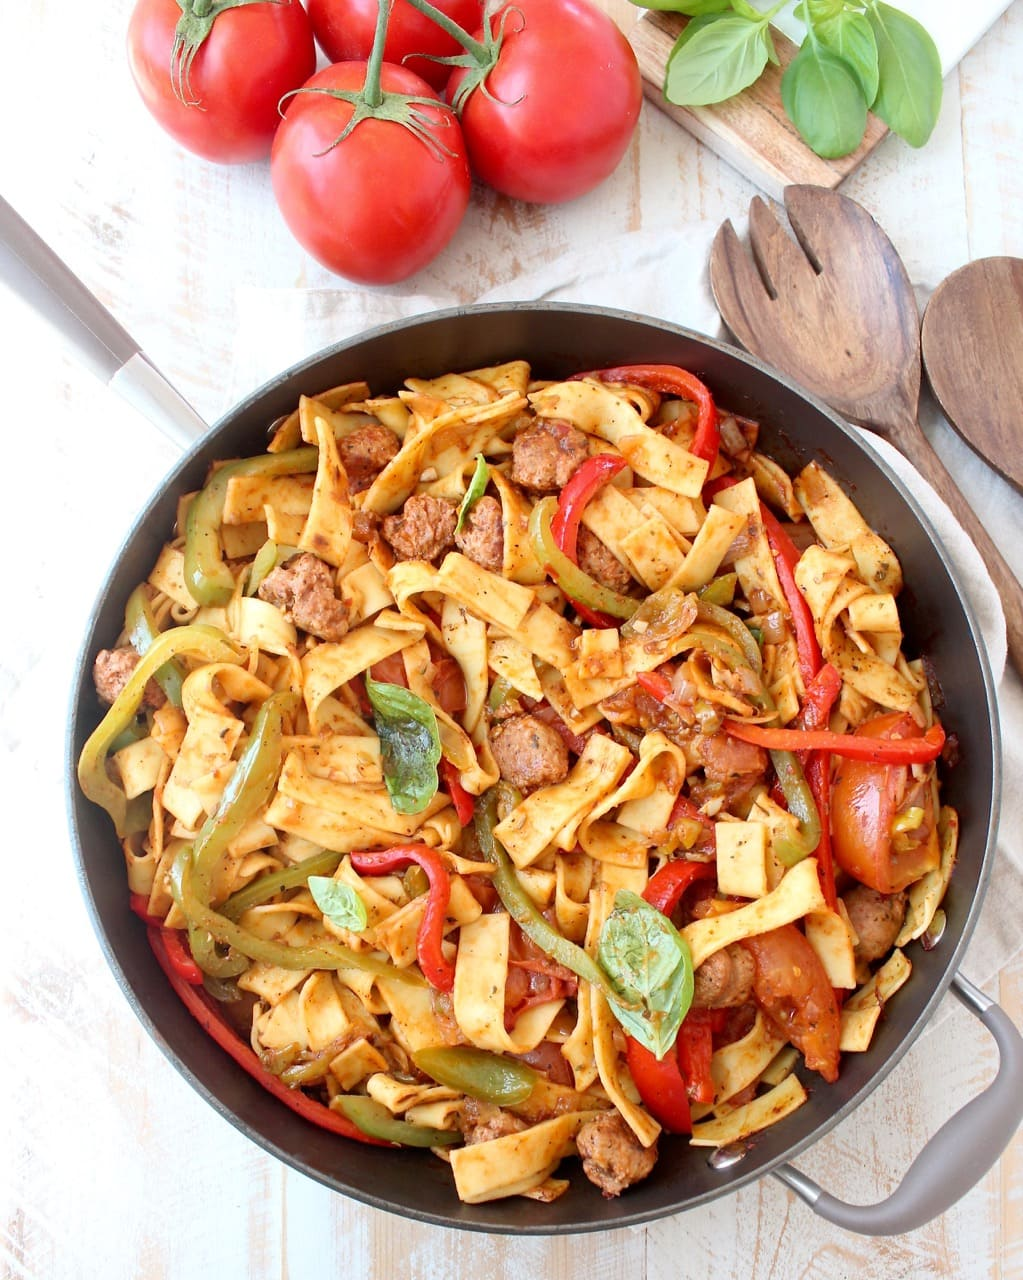 Italian Drunken Noodles Recipe in Skillet